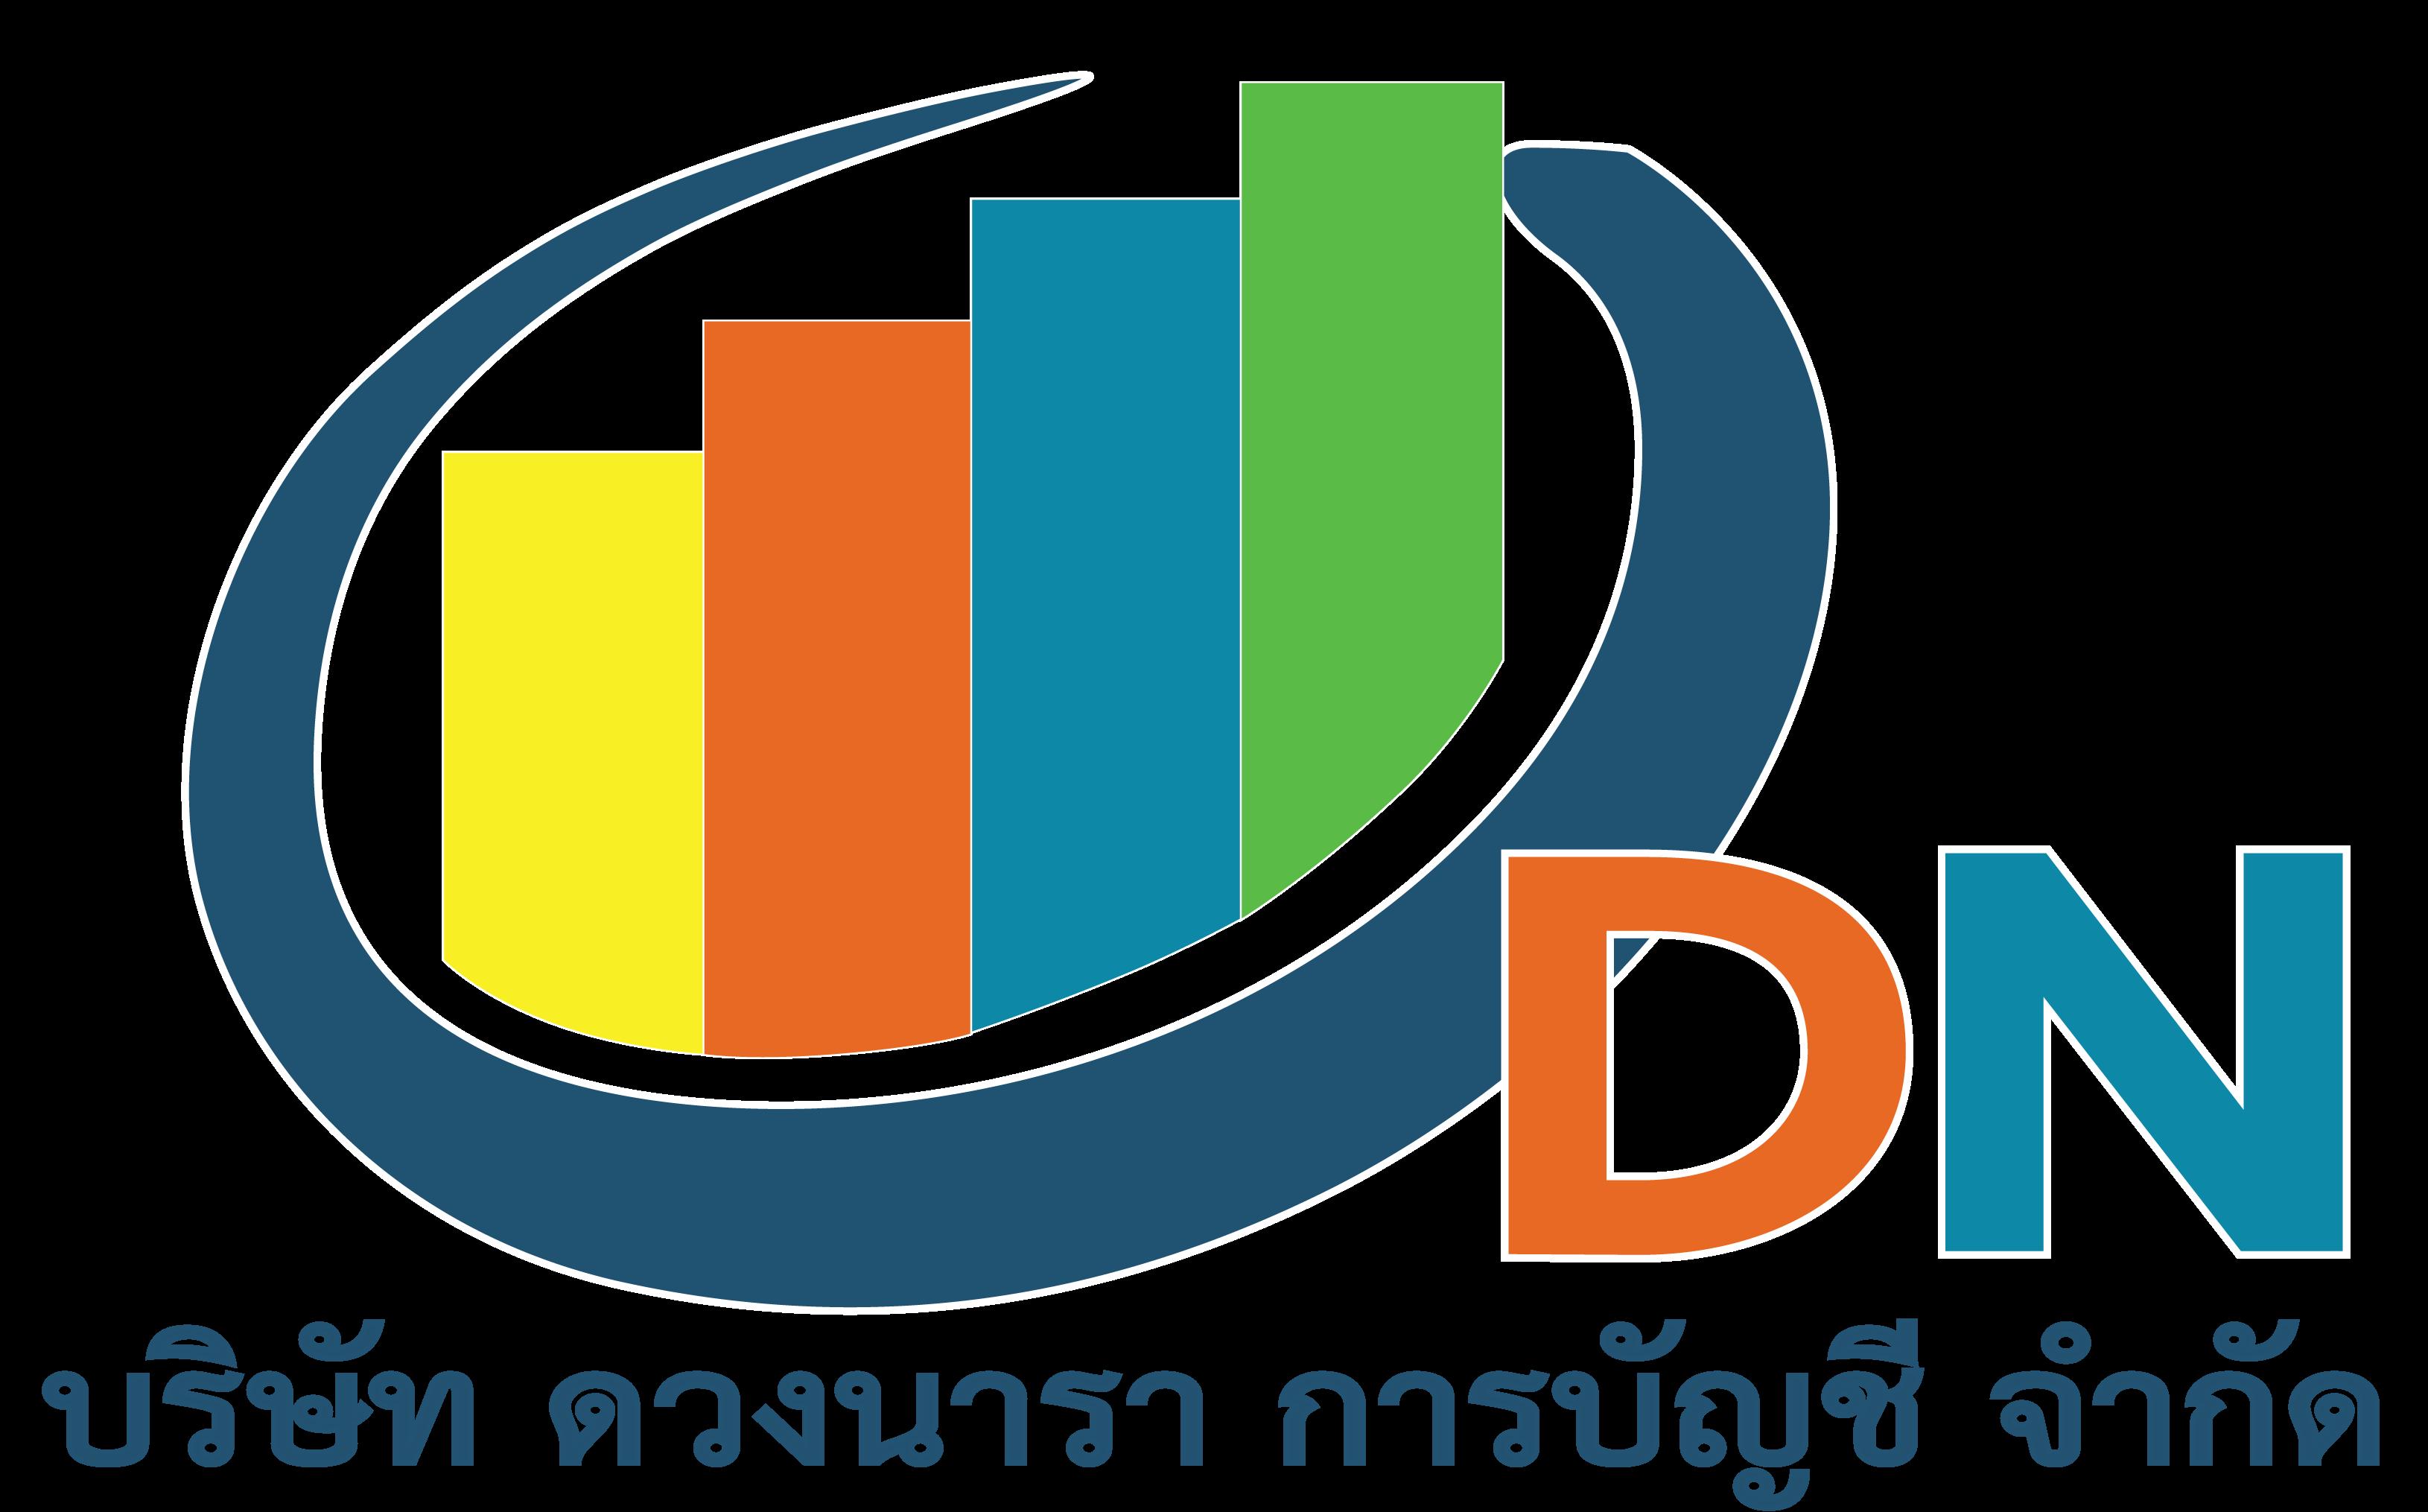 Duangnara